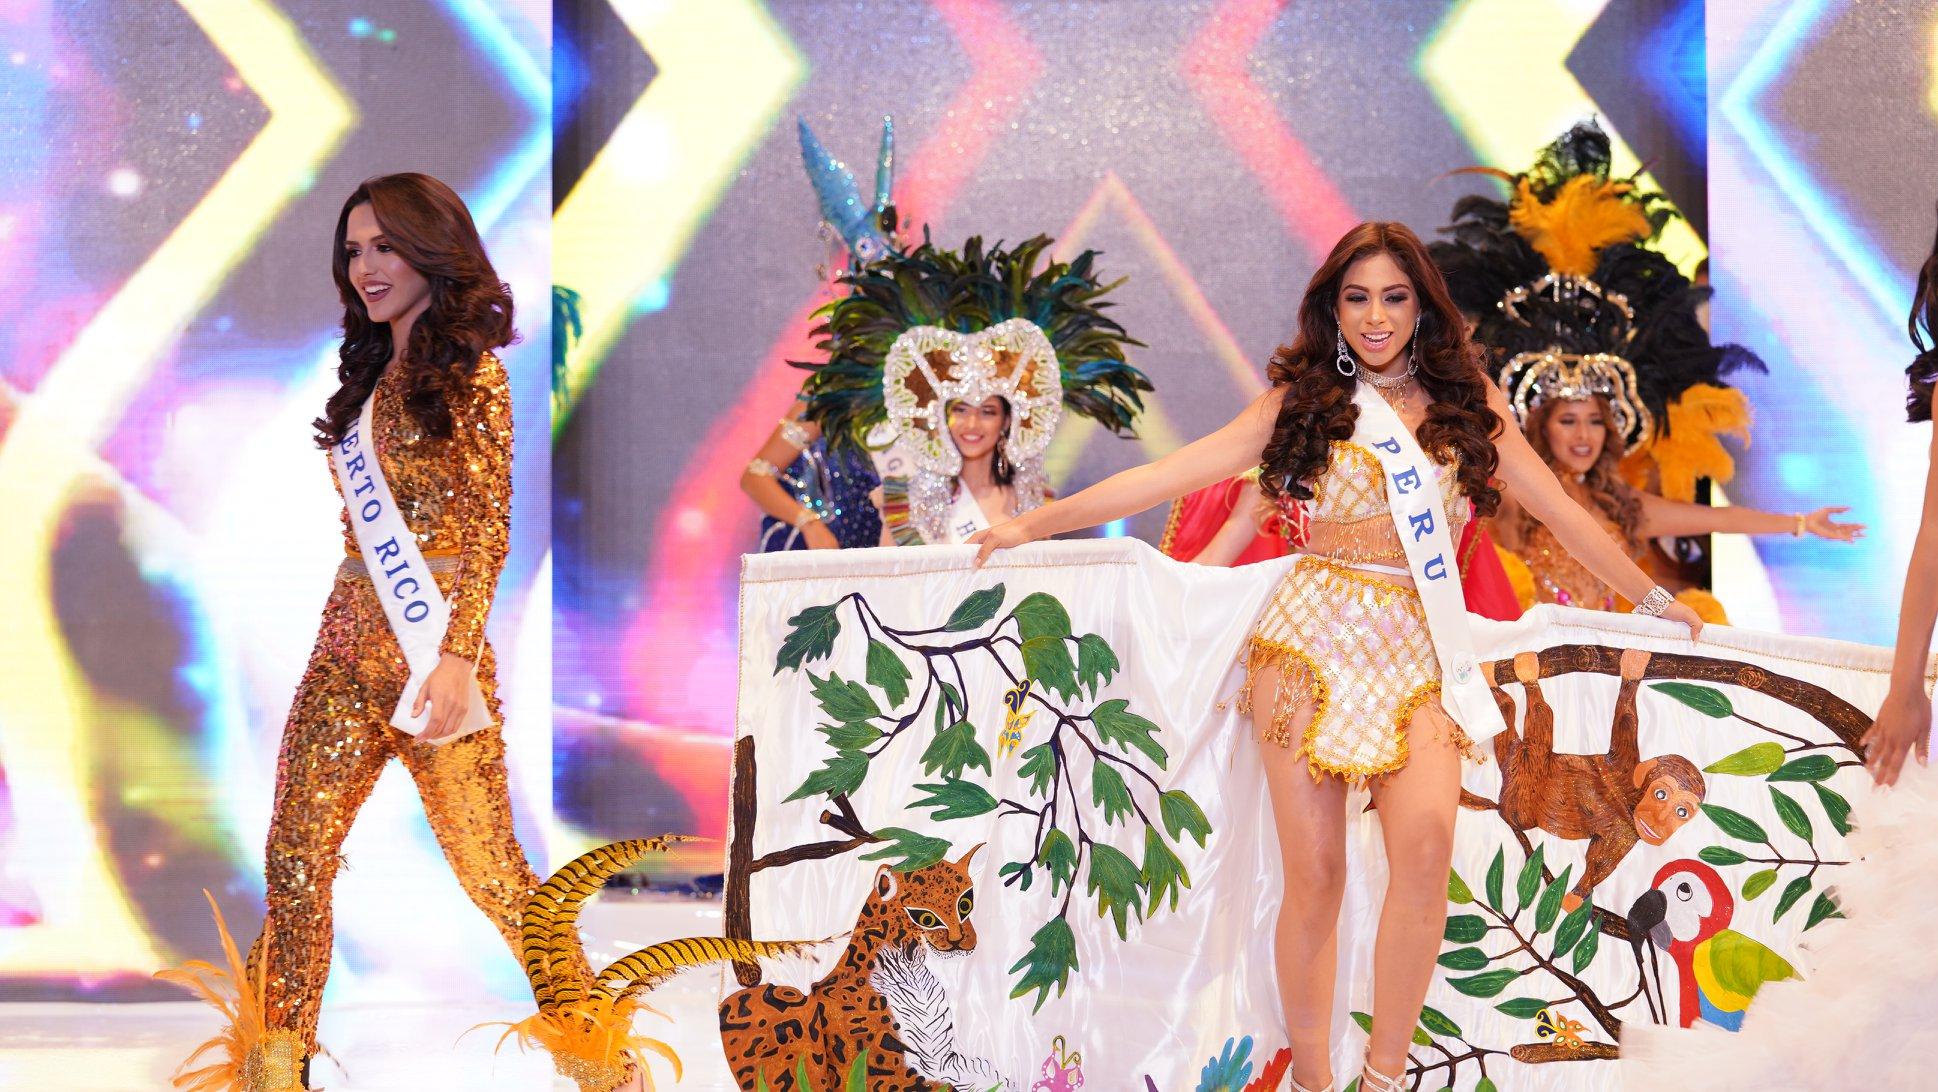 romina lopez, top 12 de miss teen mundial 2019. - Página 4 61553410